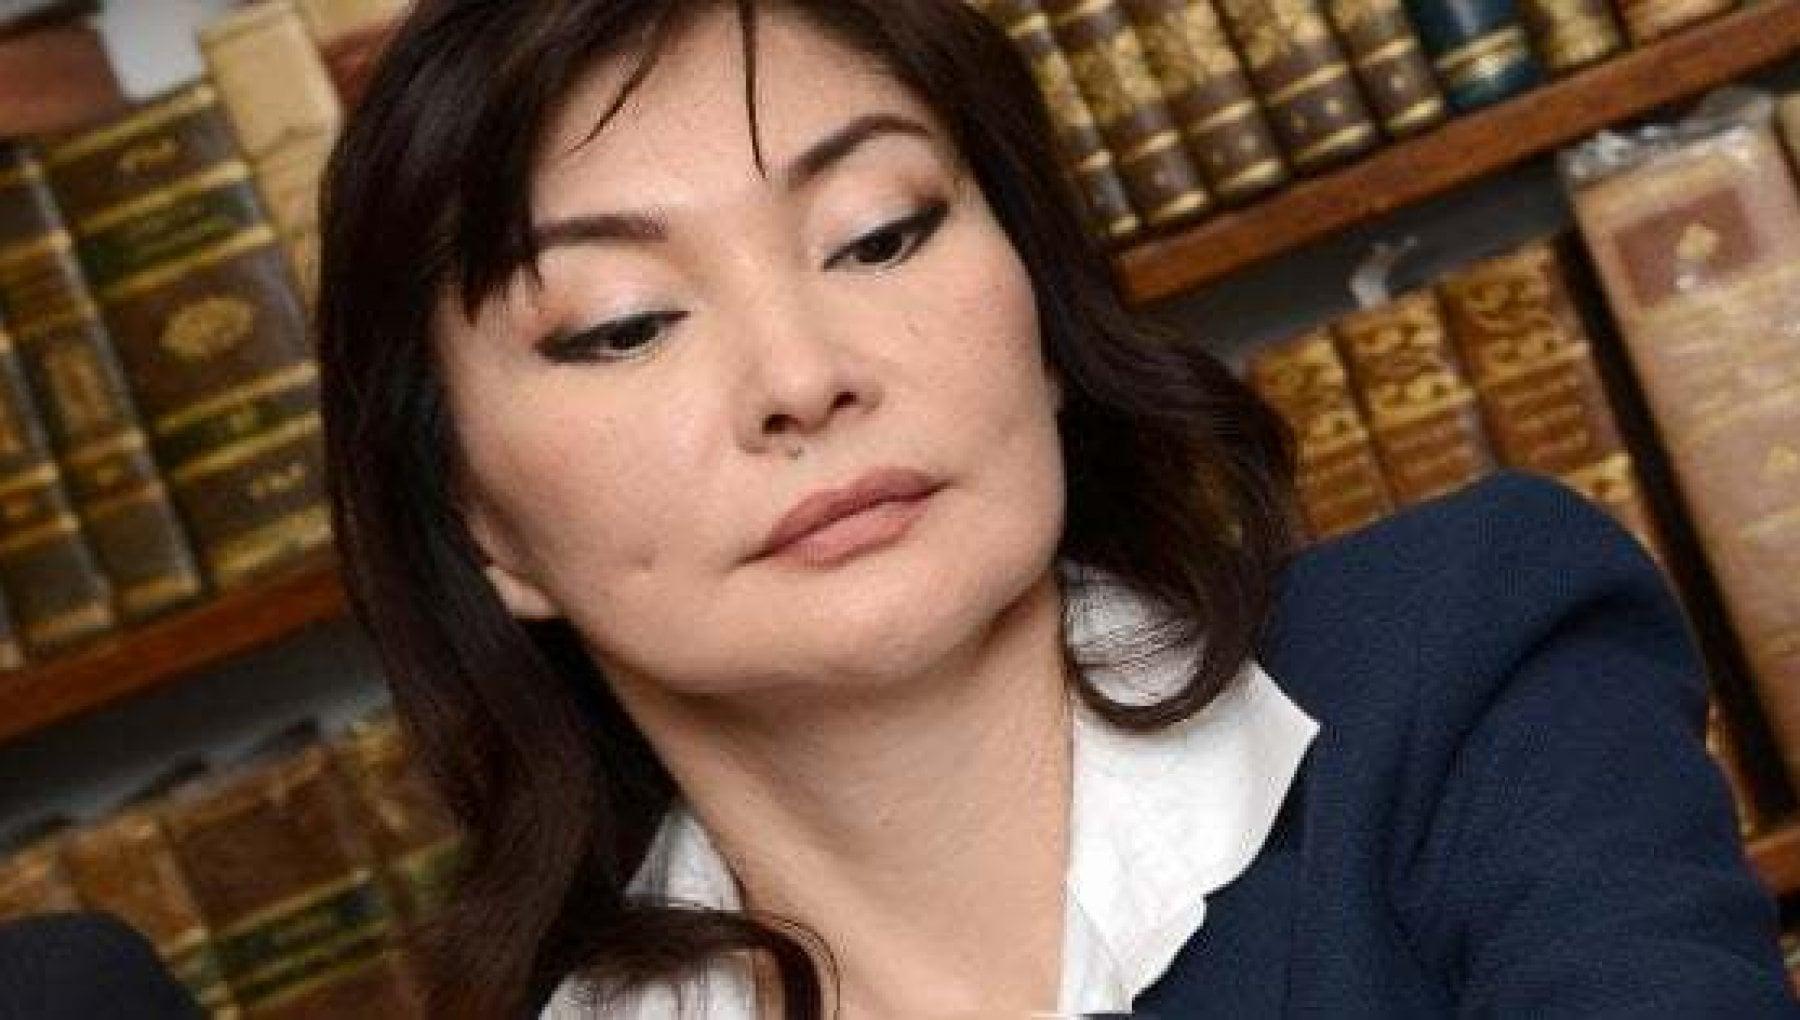 Shalabayeva i giudici Fu rapimento di Stato